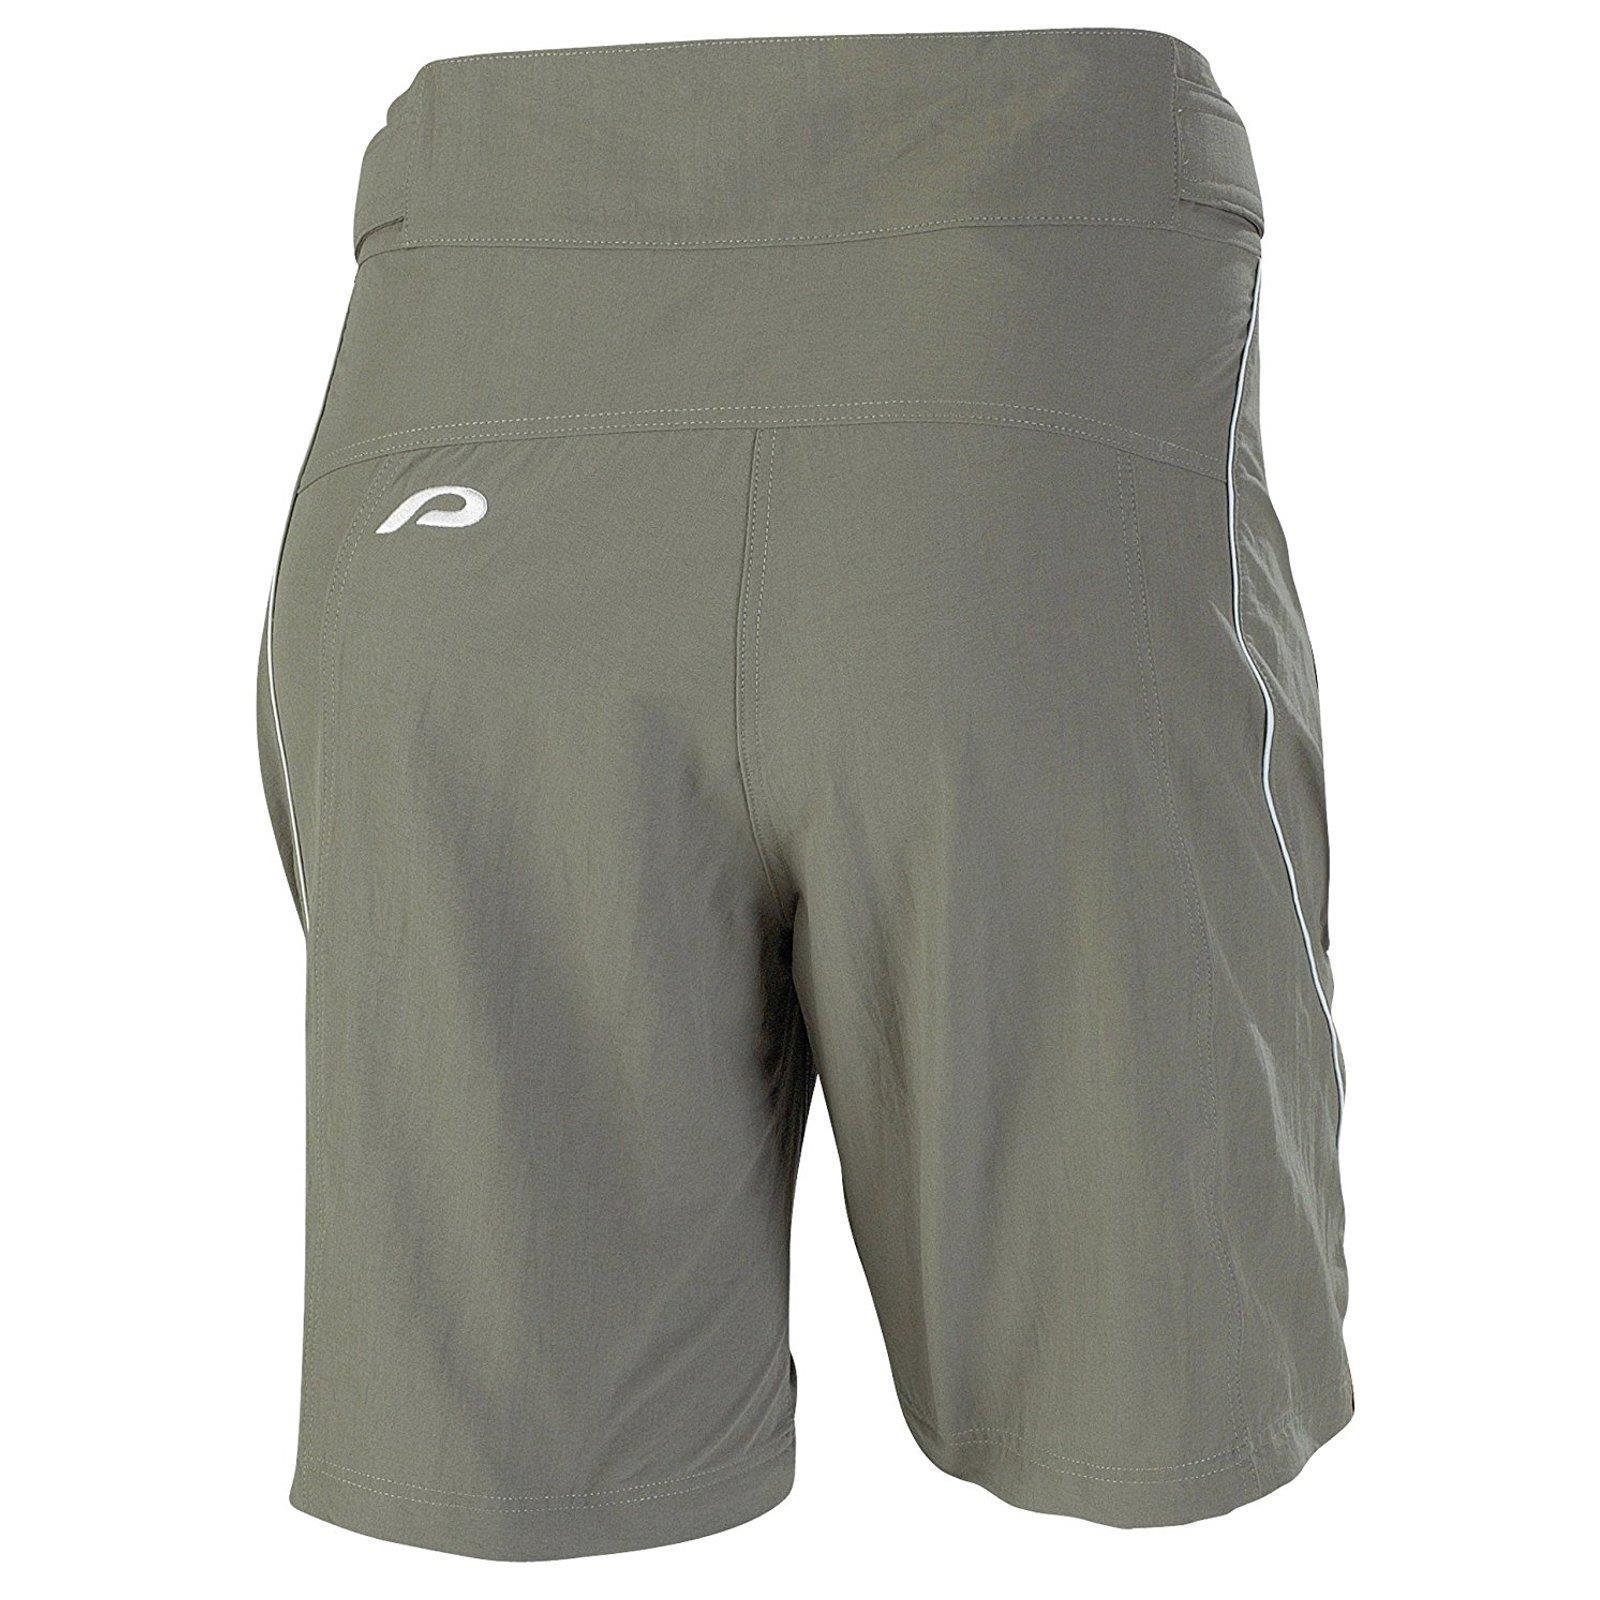 protective libra baggy shorts hose damen mtb mountainbike fahrrad trekking tour. Black Bedroom Furniture Sets. Home Design Ideas